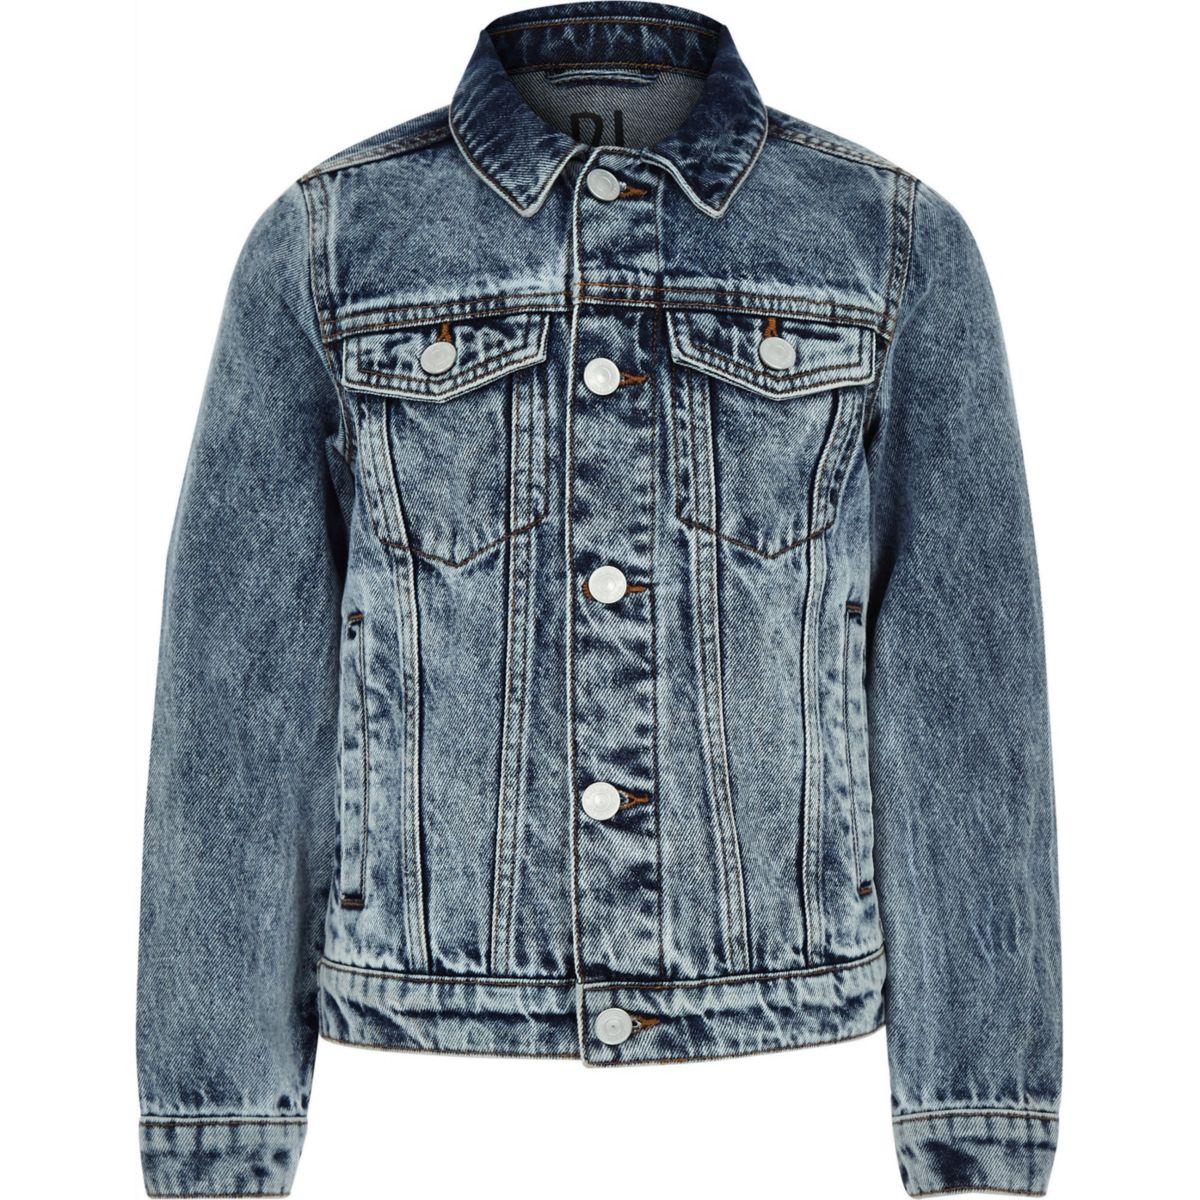 Boys RI Studio blue acid wash denim jacket